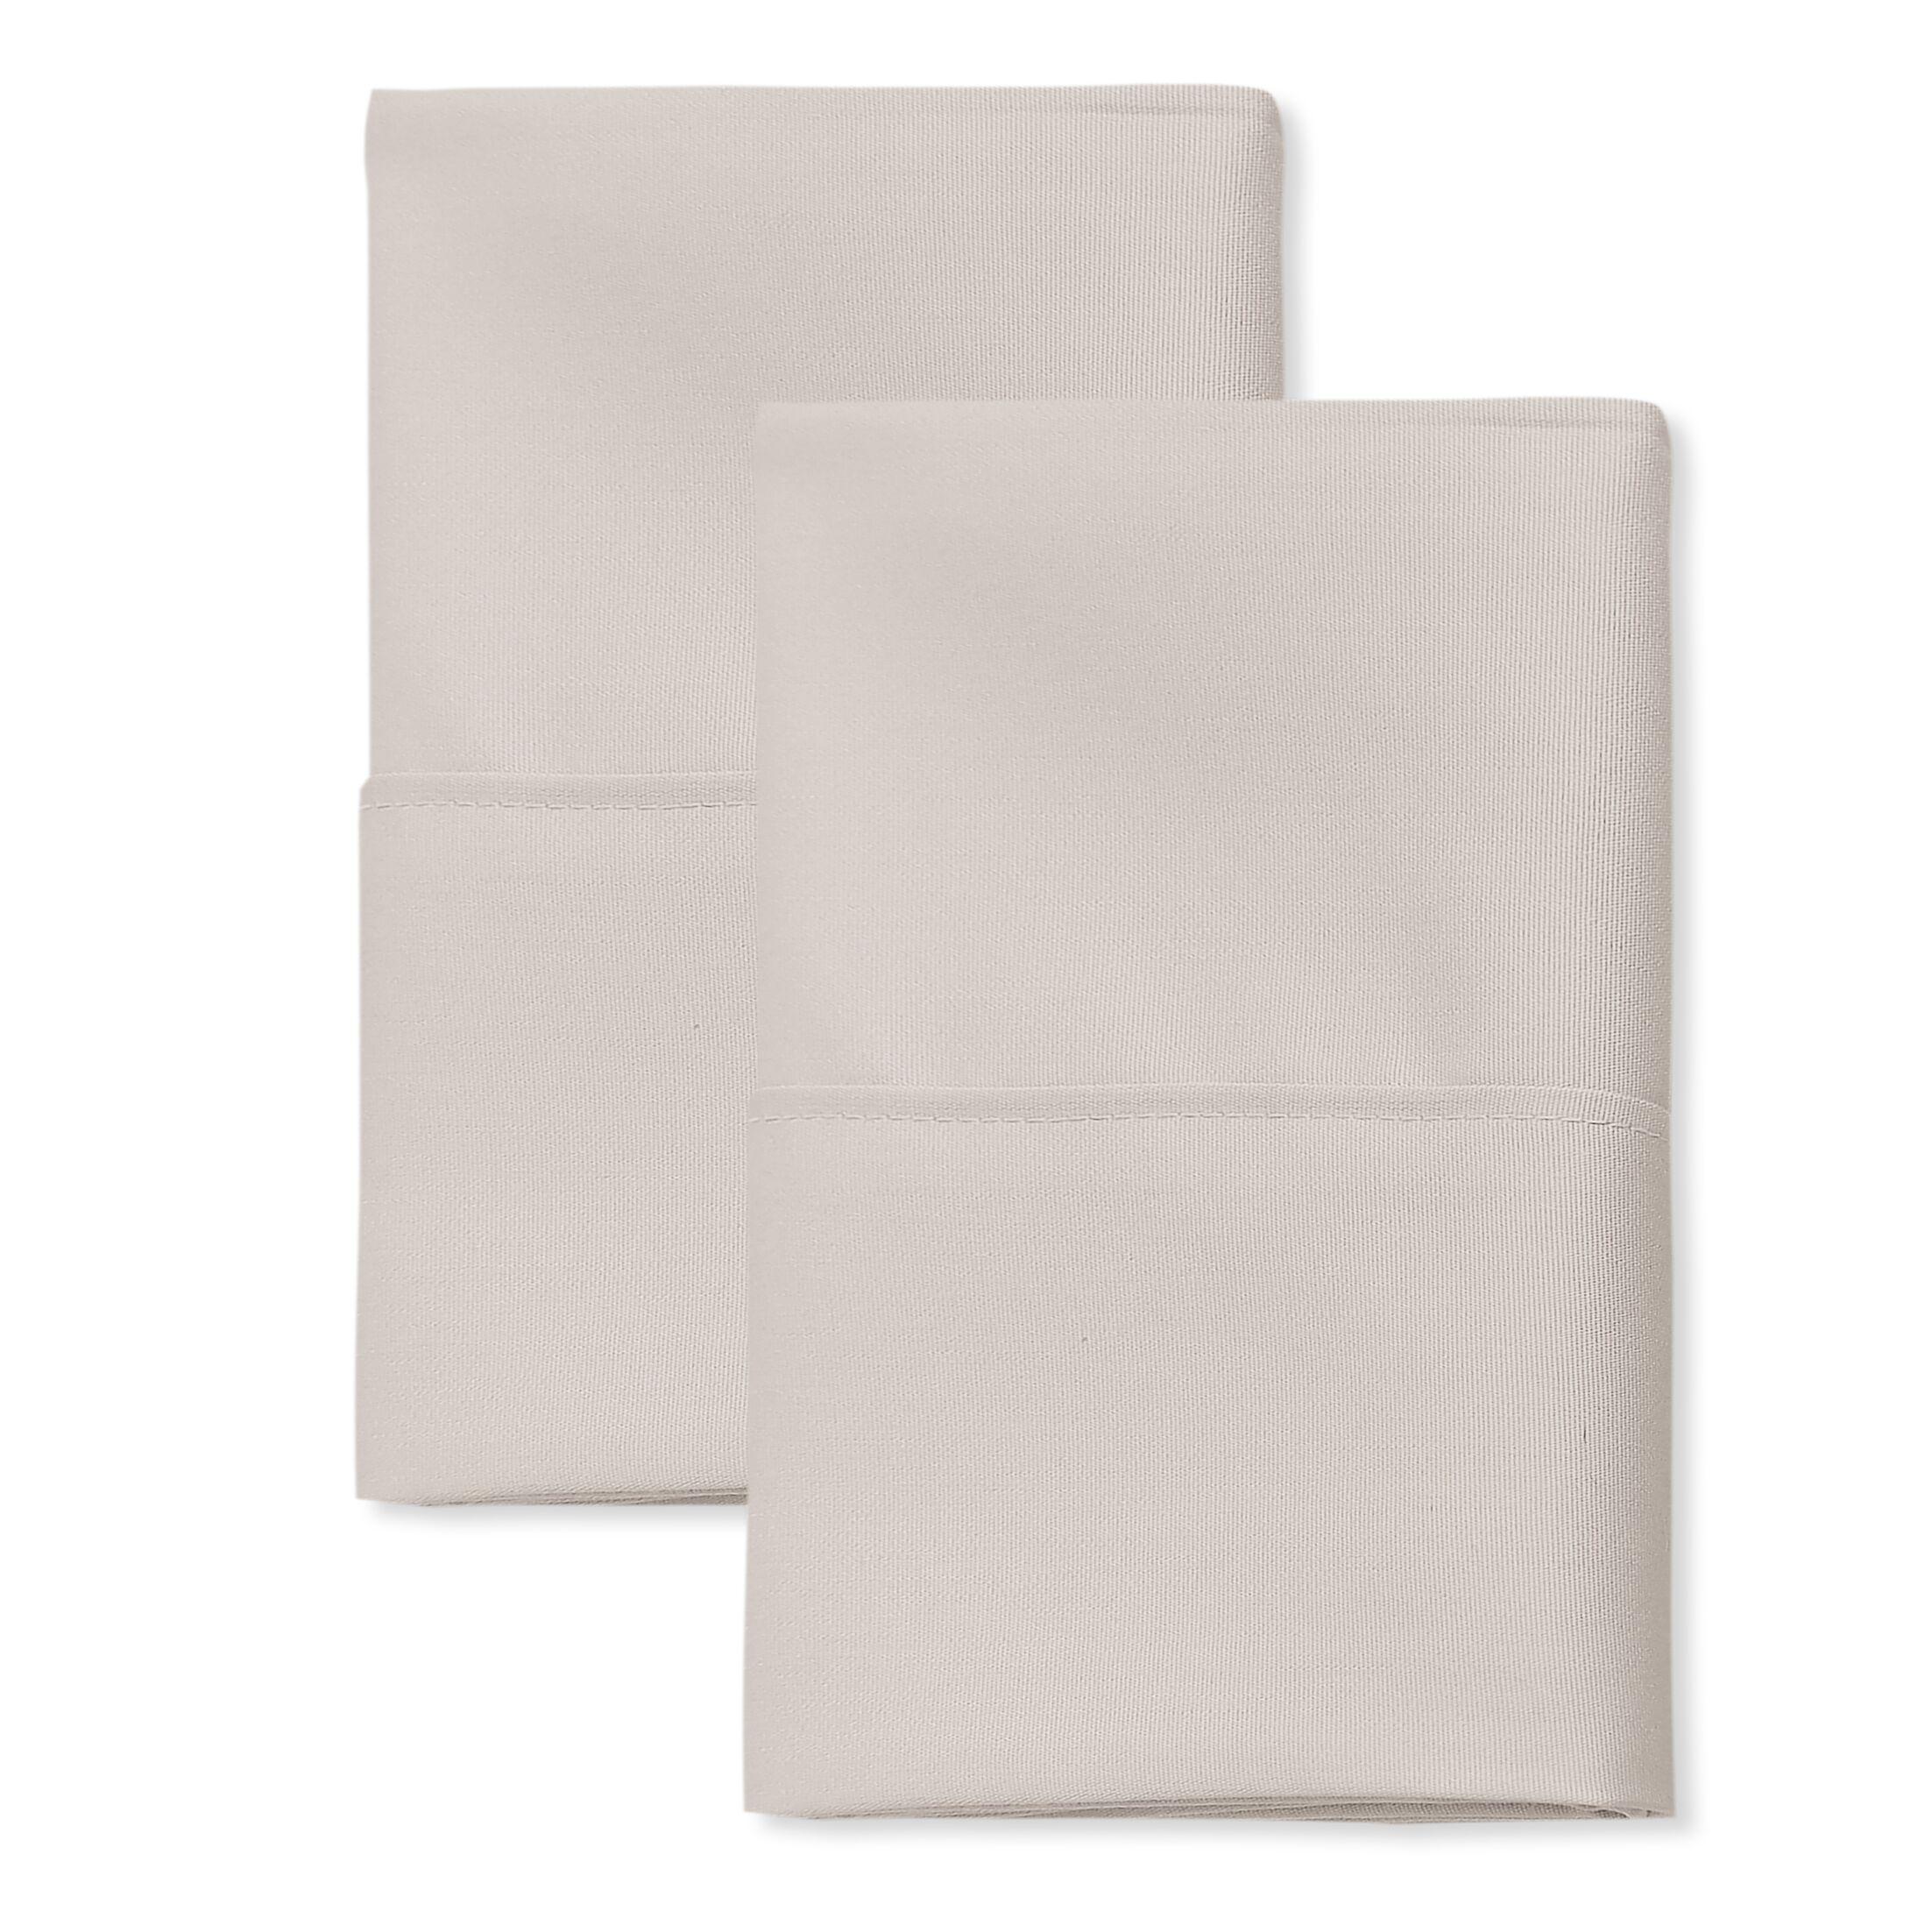 San'T Agnello Hotel Pillowcase Color: Ivory, Size: King